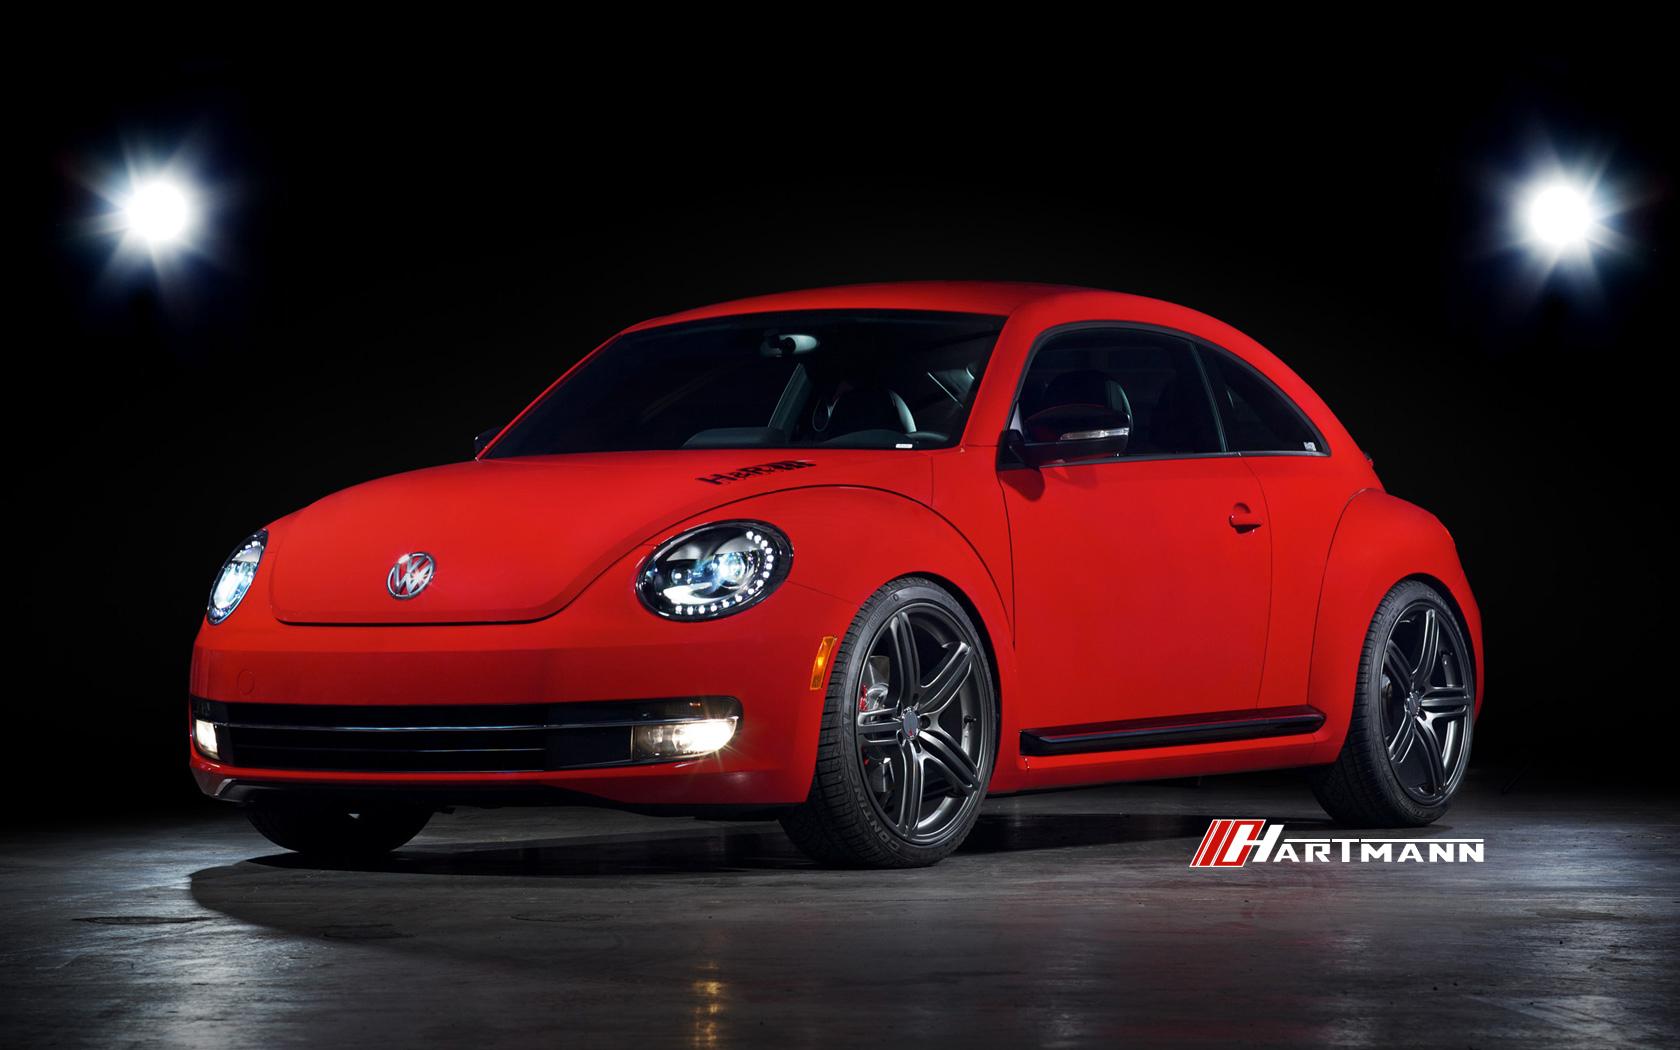 Hartmann Hrs6 204 Ma Wheels For Volkswagen Fitment